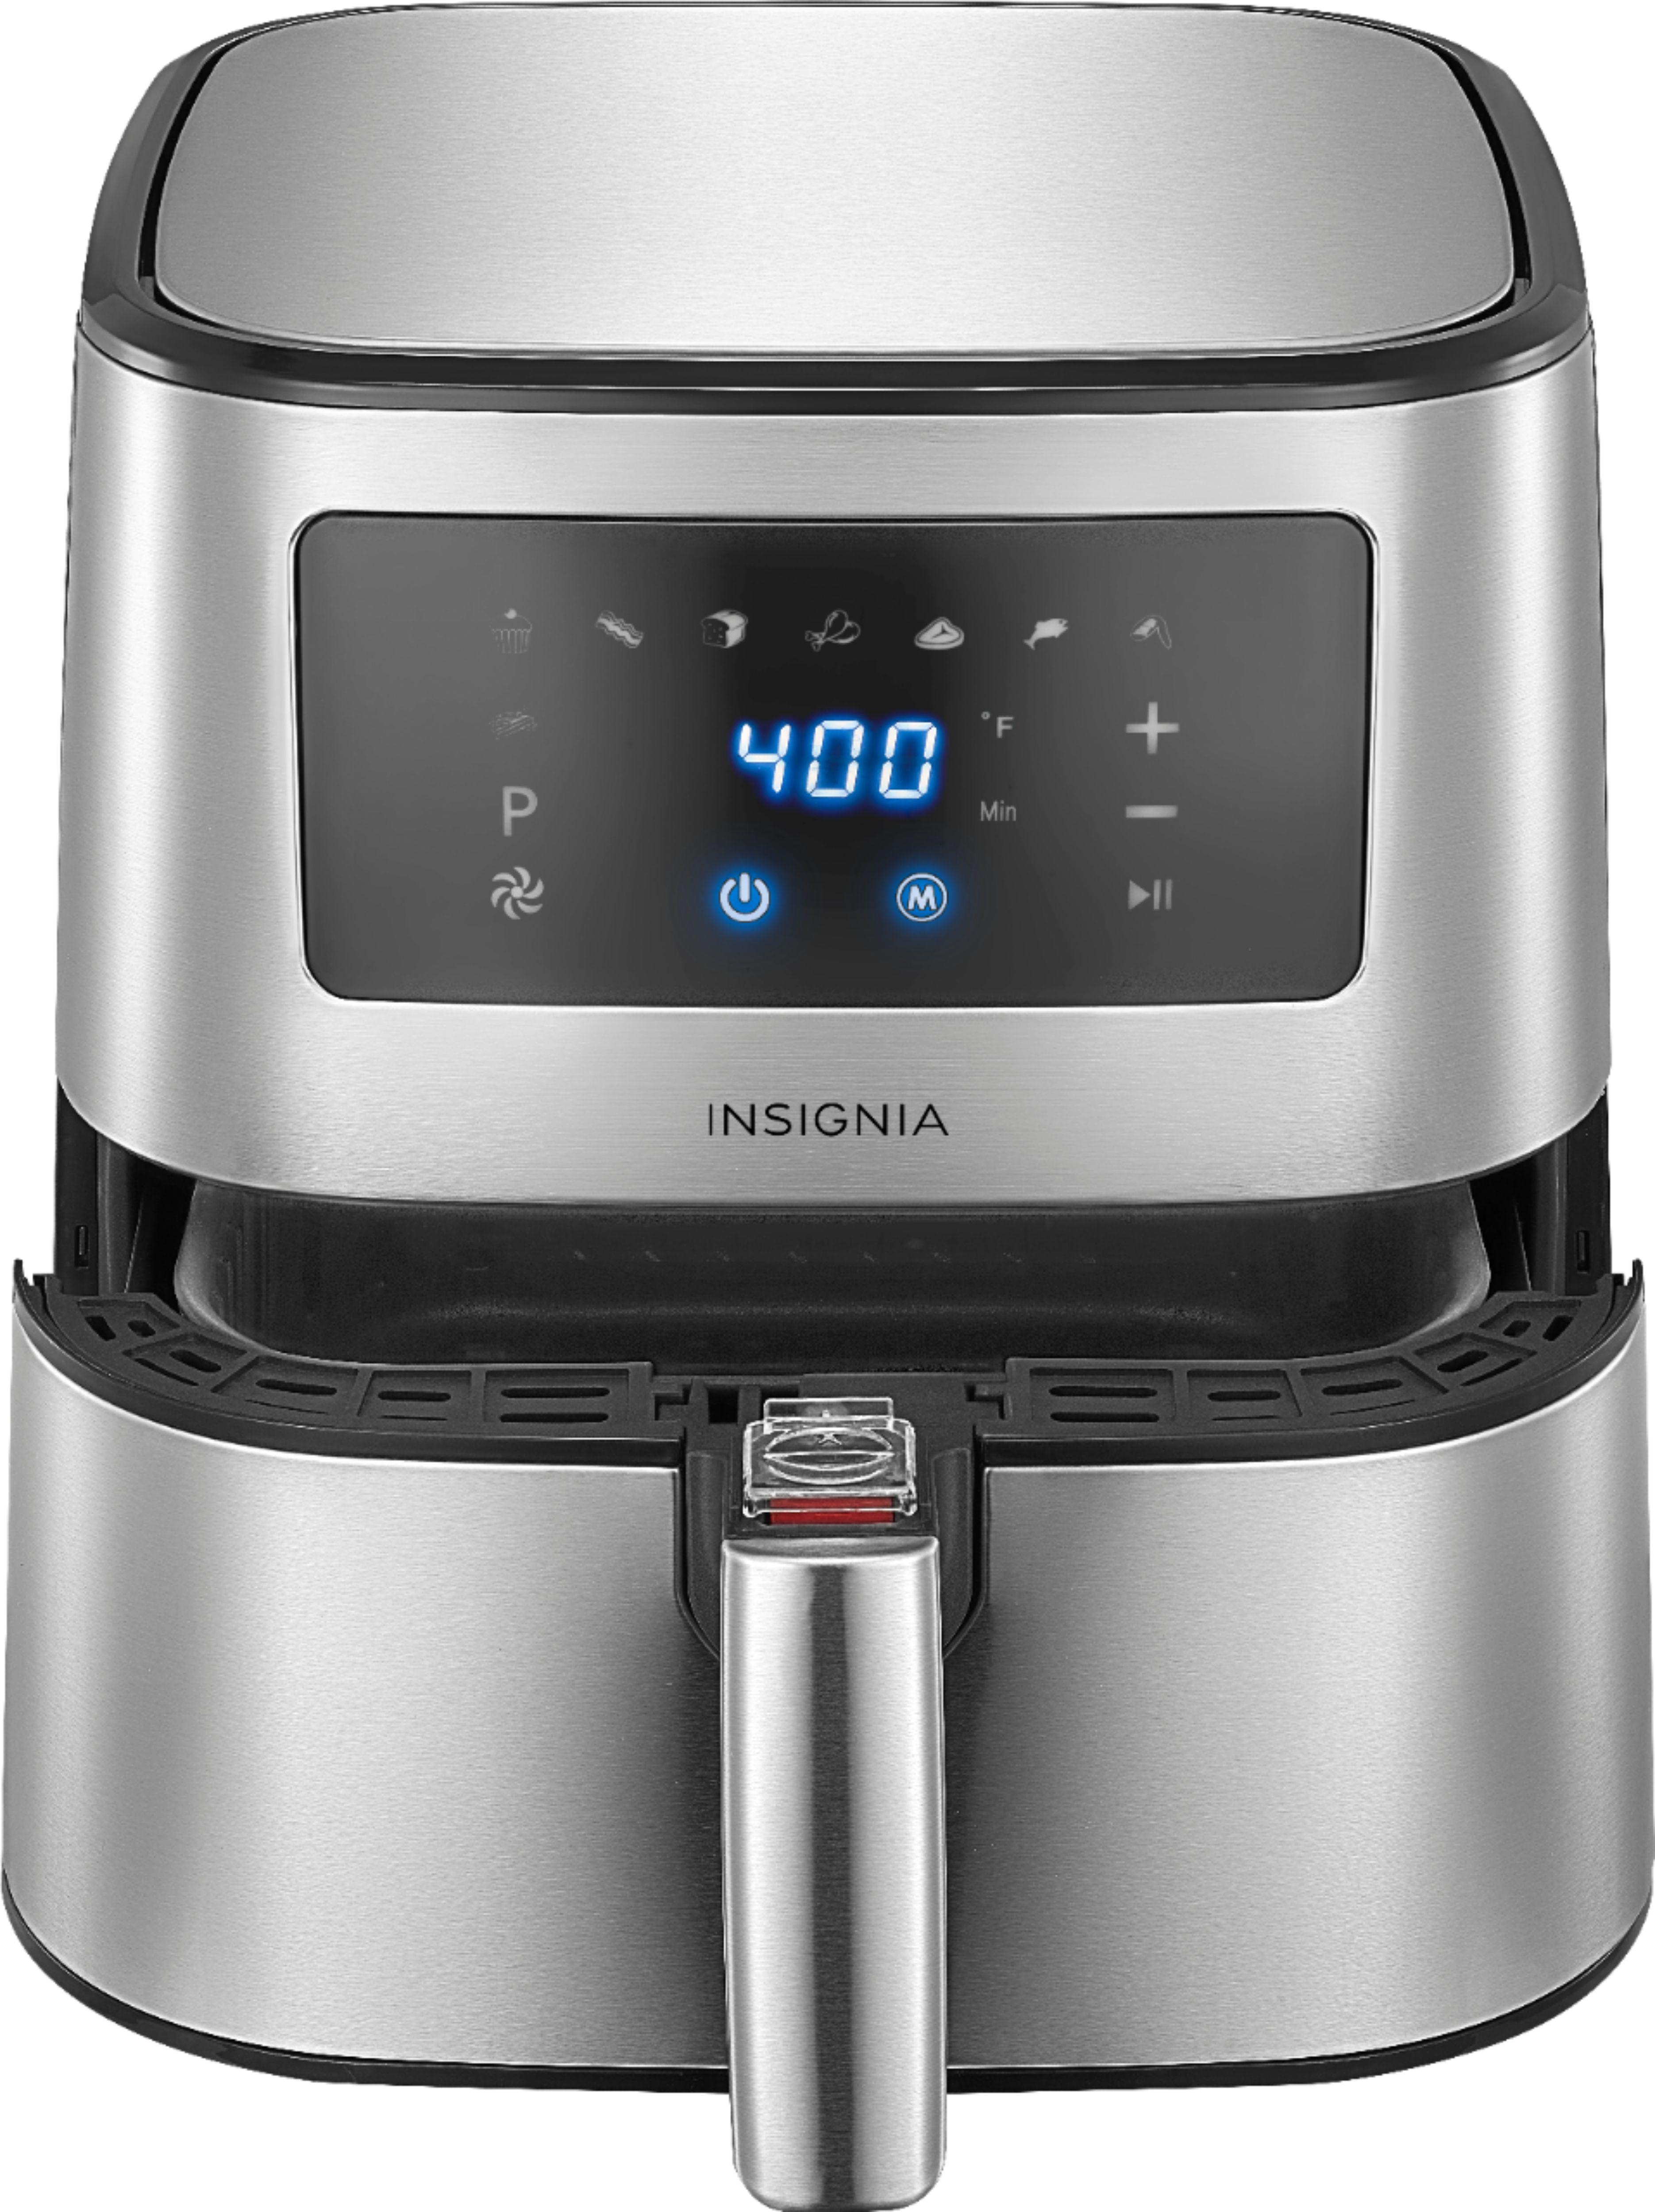 Insignia 5-qt. Digital Air Fryer - Stainless Steel, best buy, $50